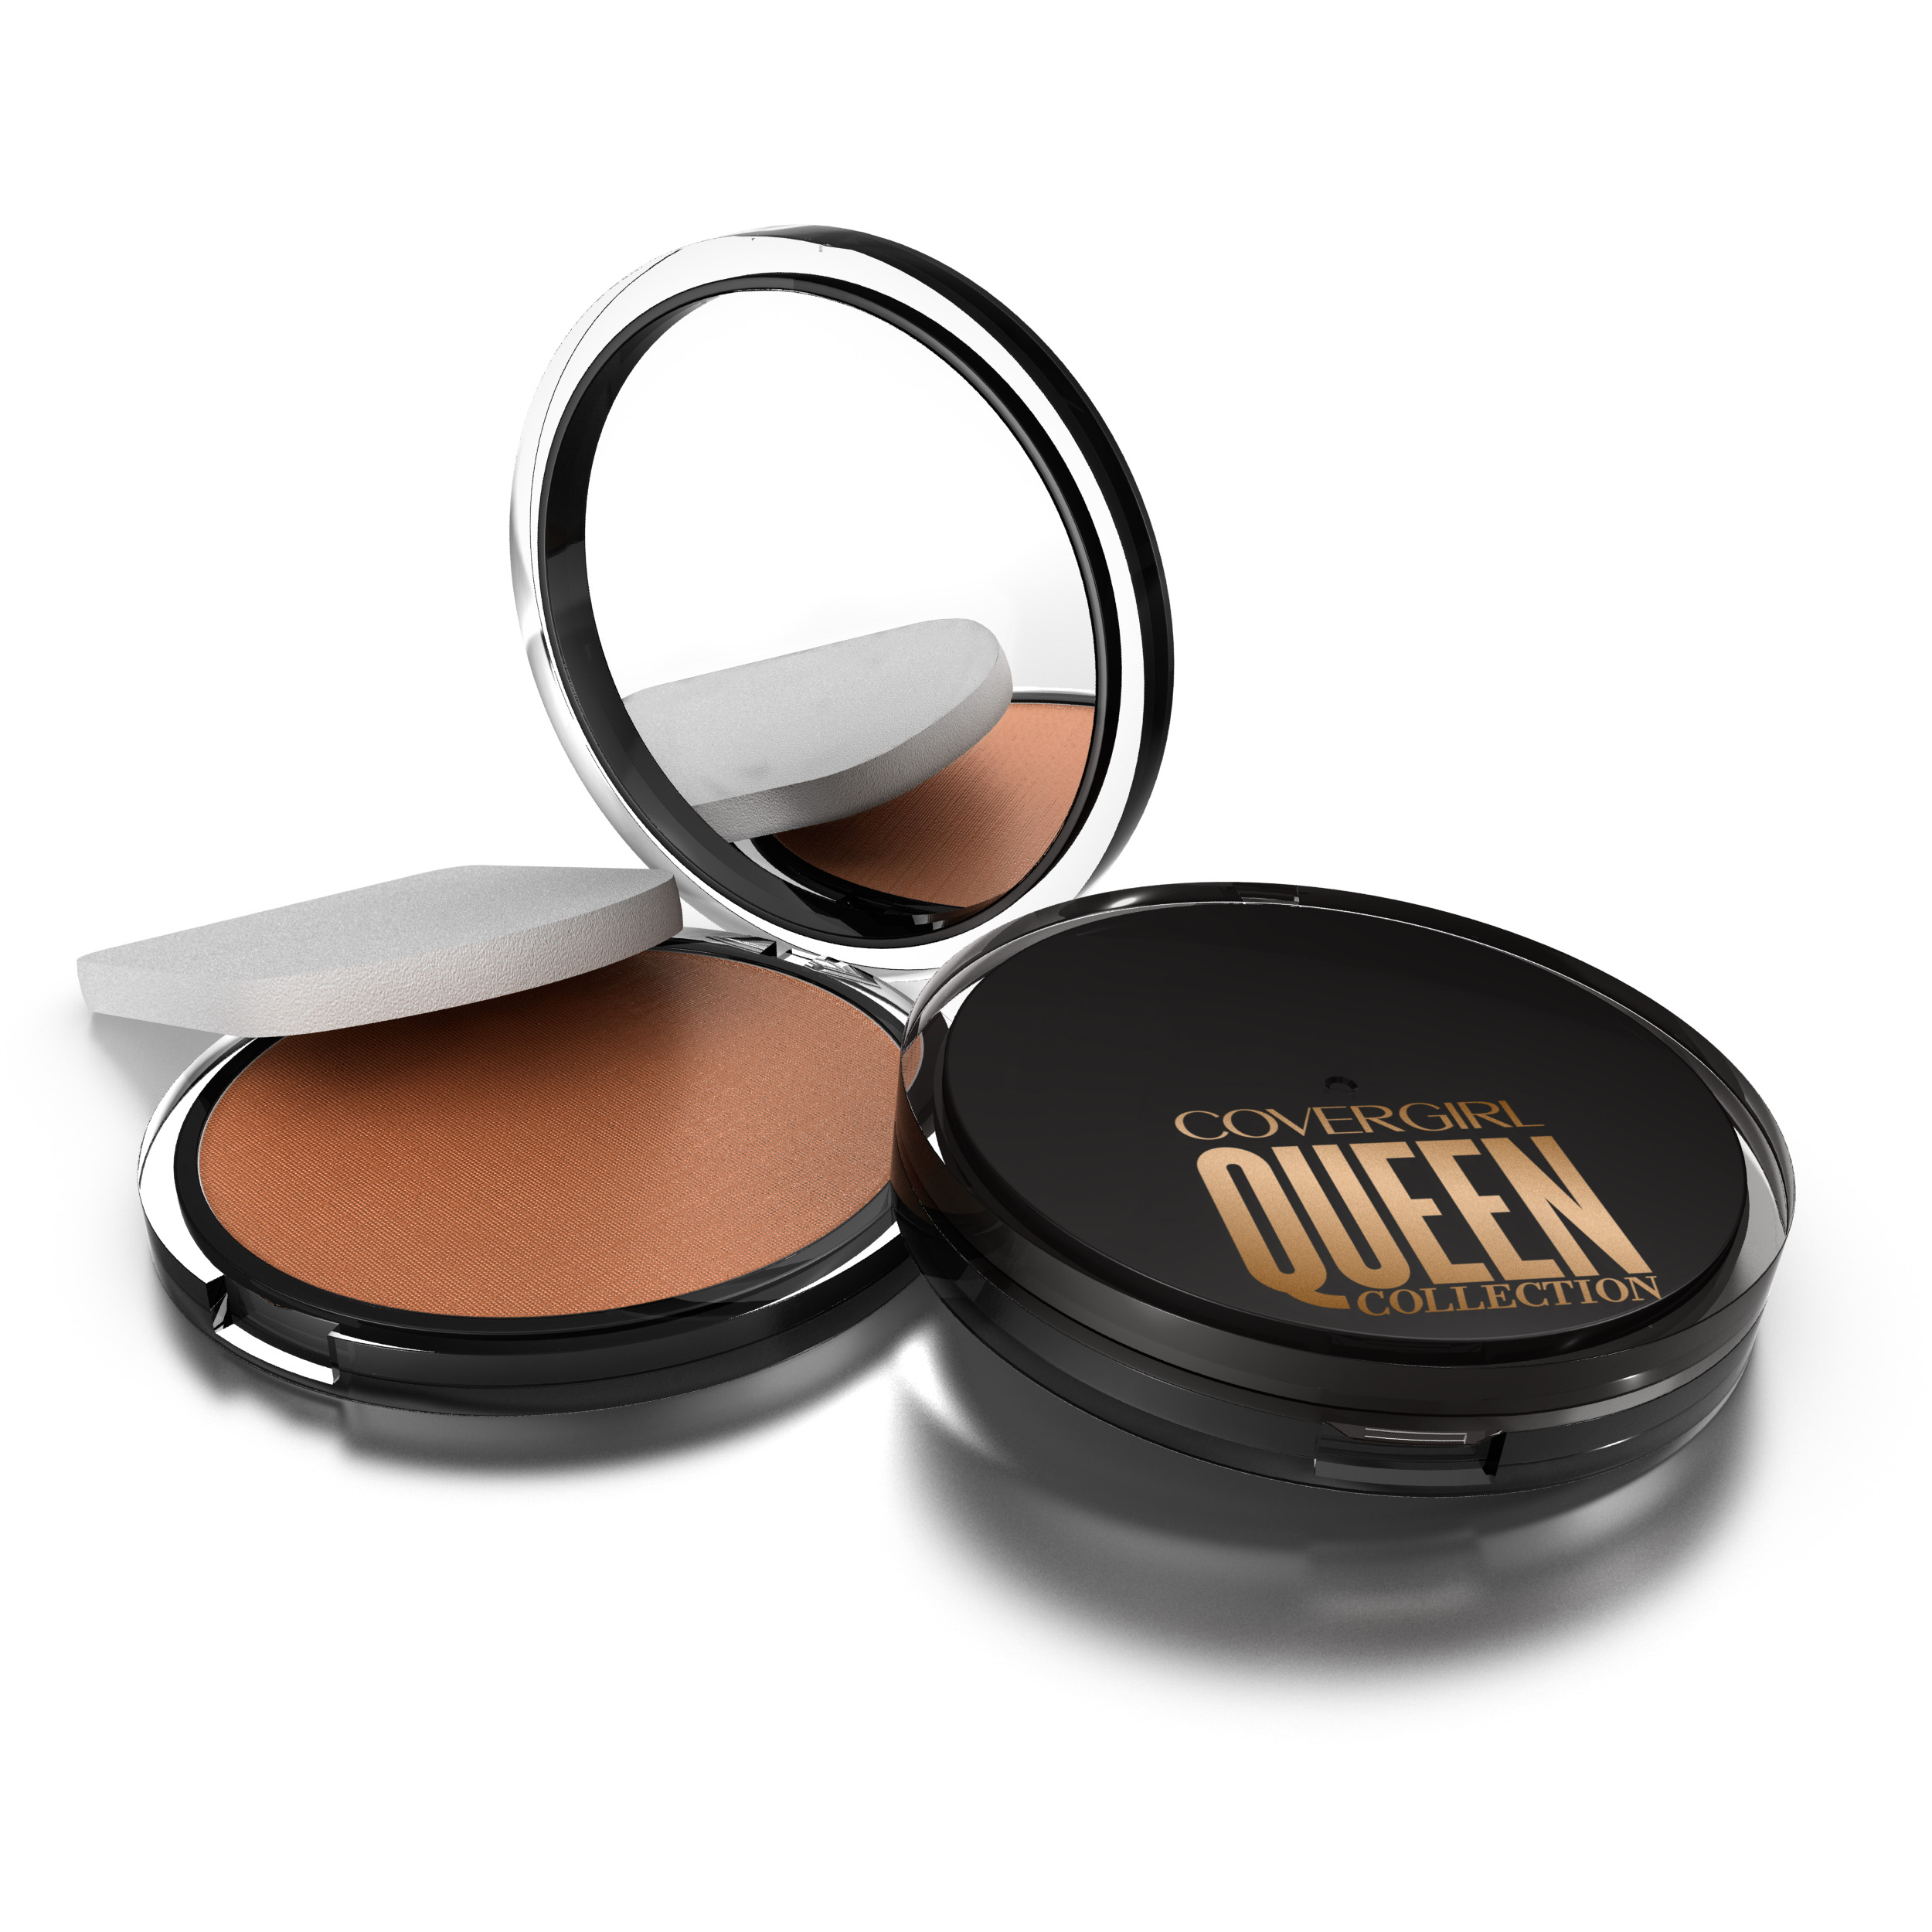 CG Queen Lasting Matte Pressed Powder Foundation Golden Medium